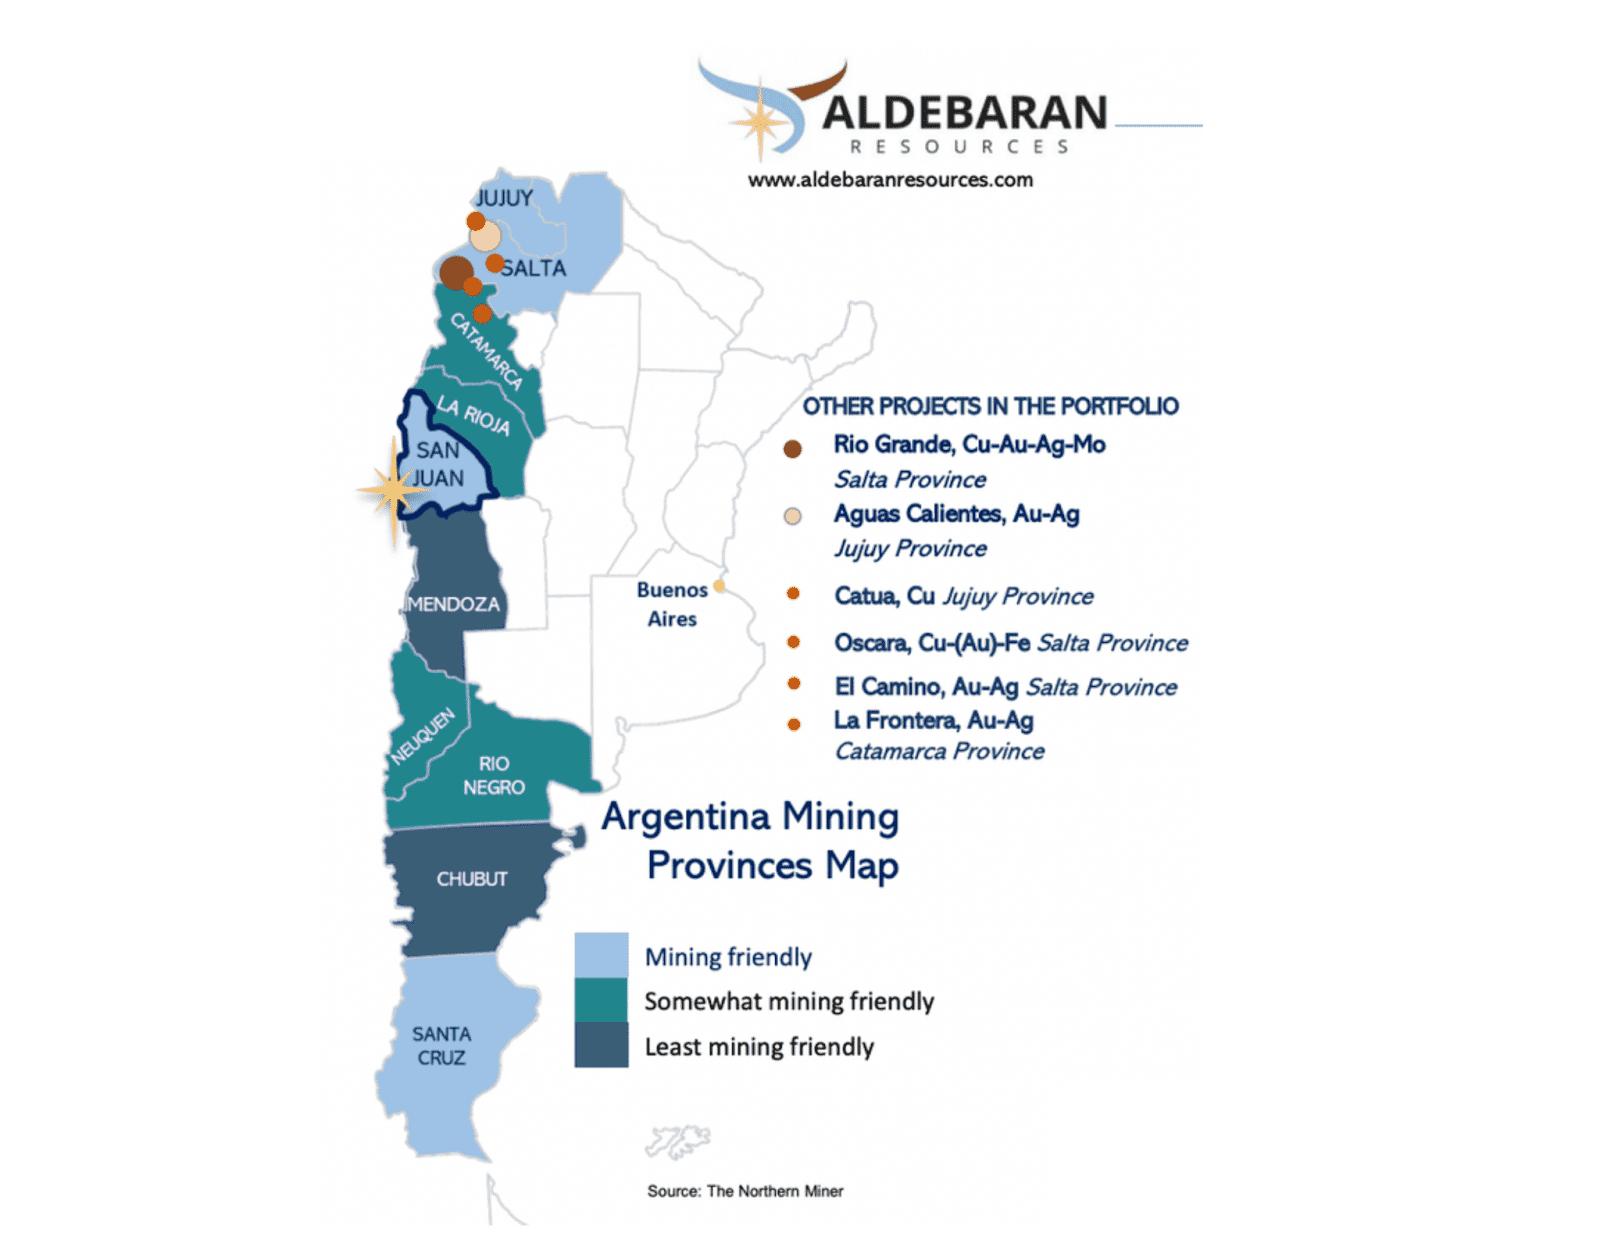 aldebaran resources argentina map